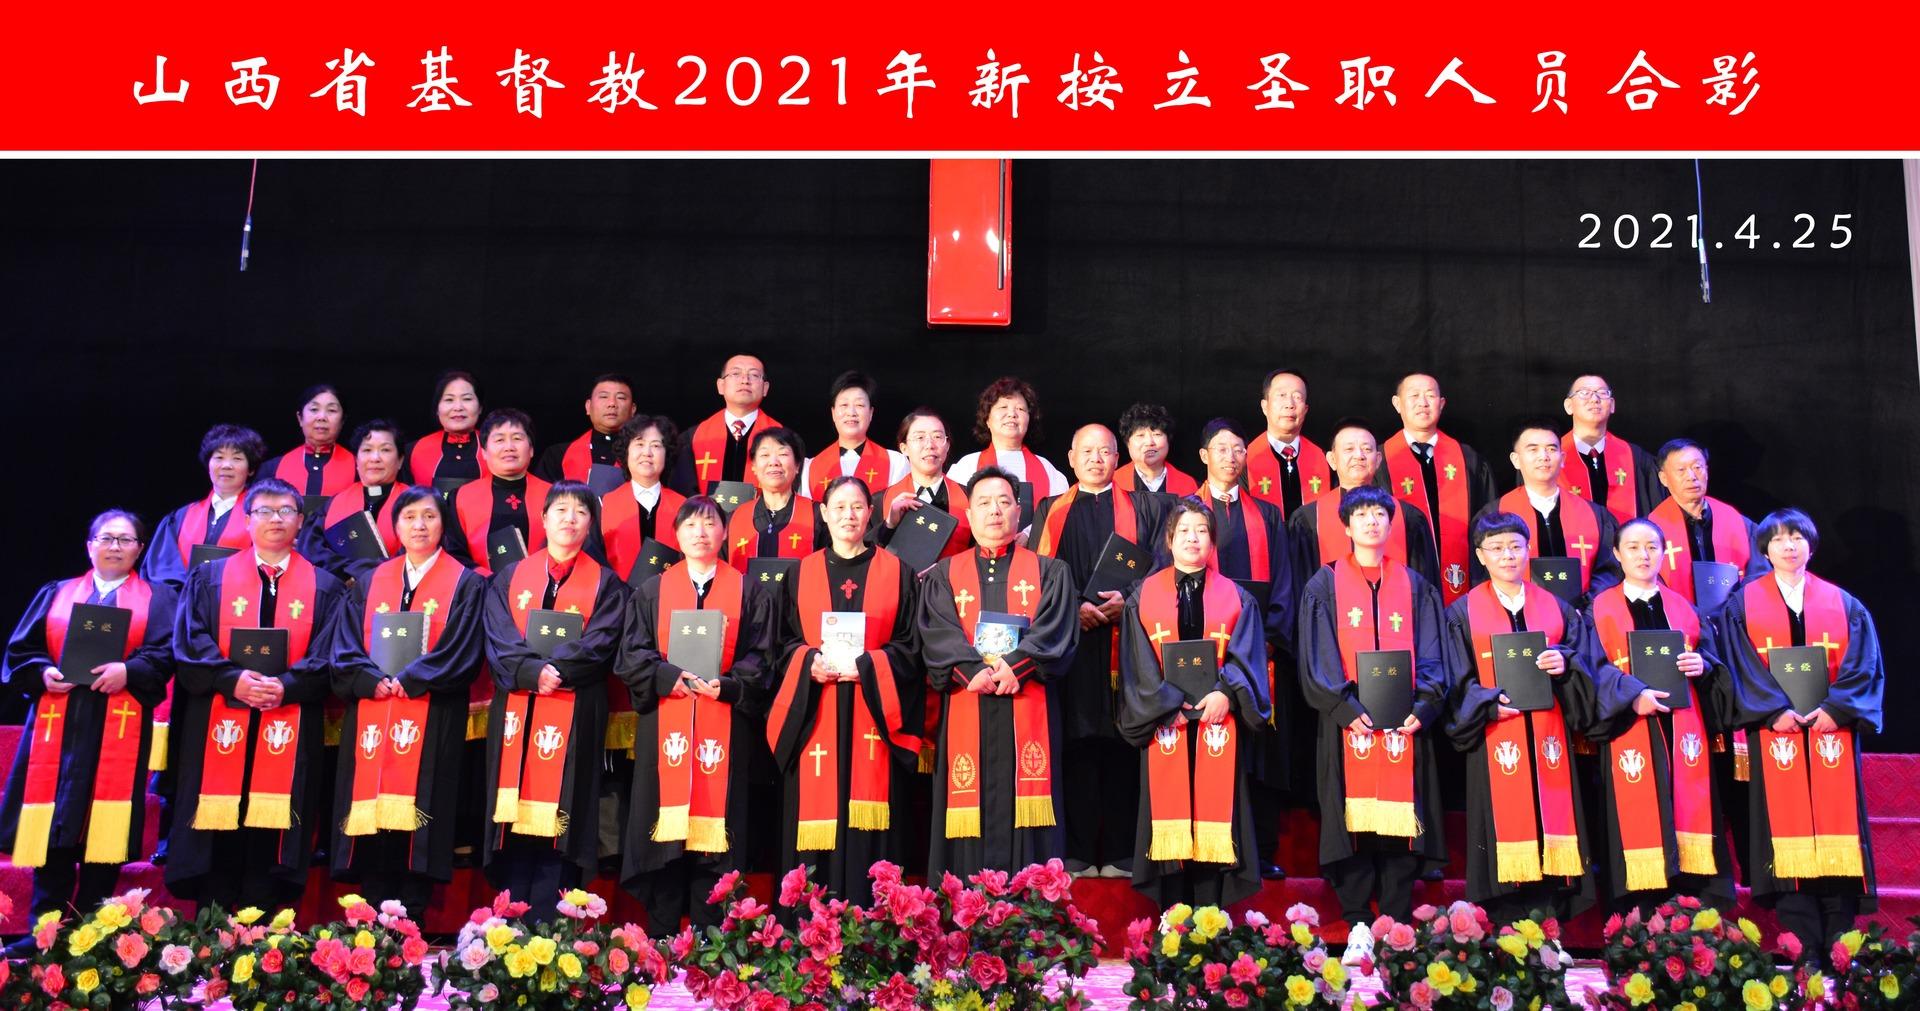 Sichuan CC and Shanxi CC&TSPM Ordain Pastors and Elders